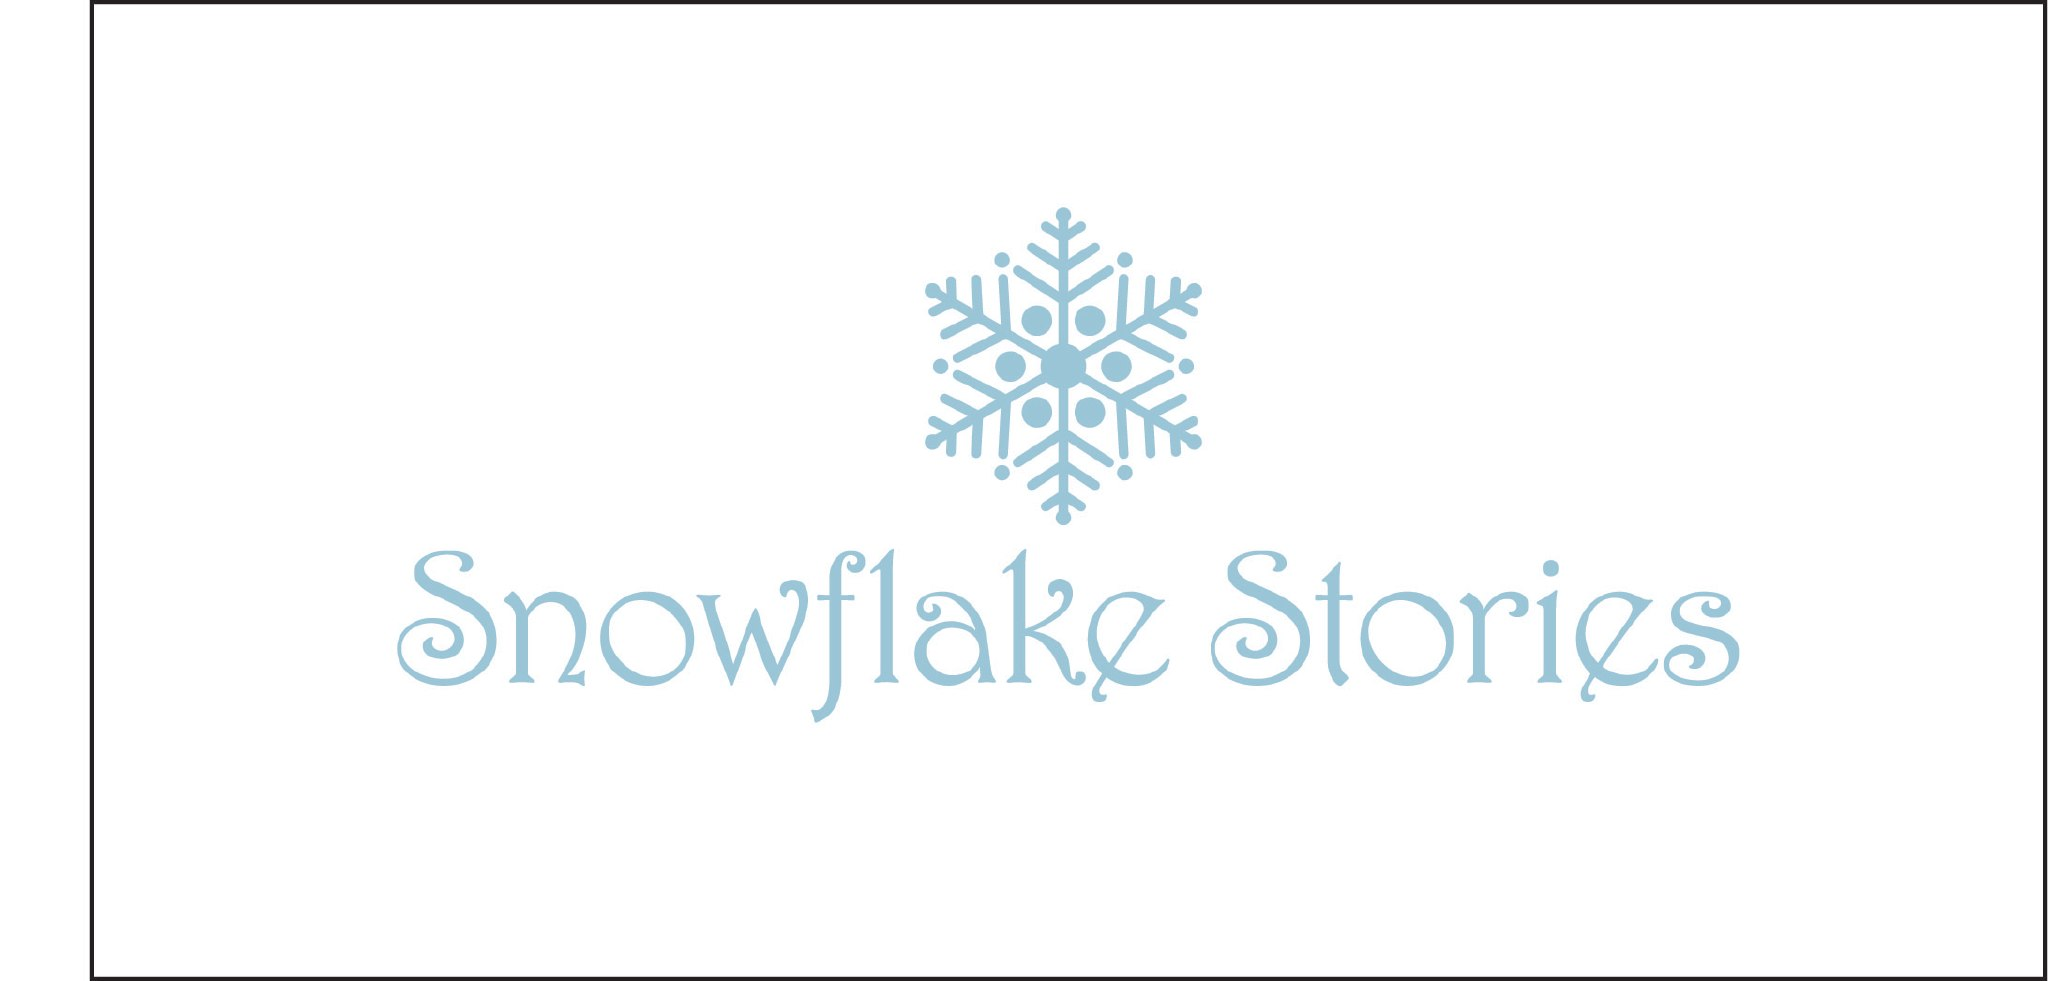 Snowflake Stories